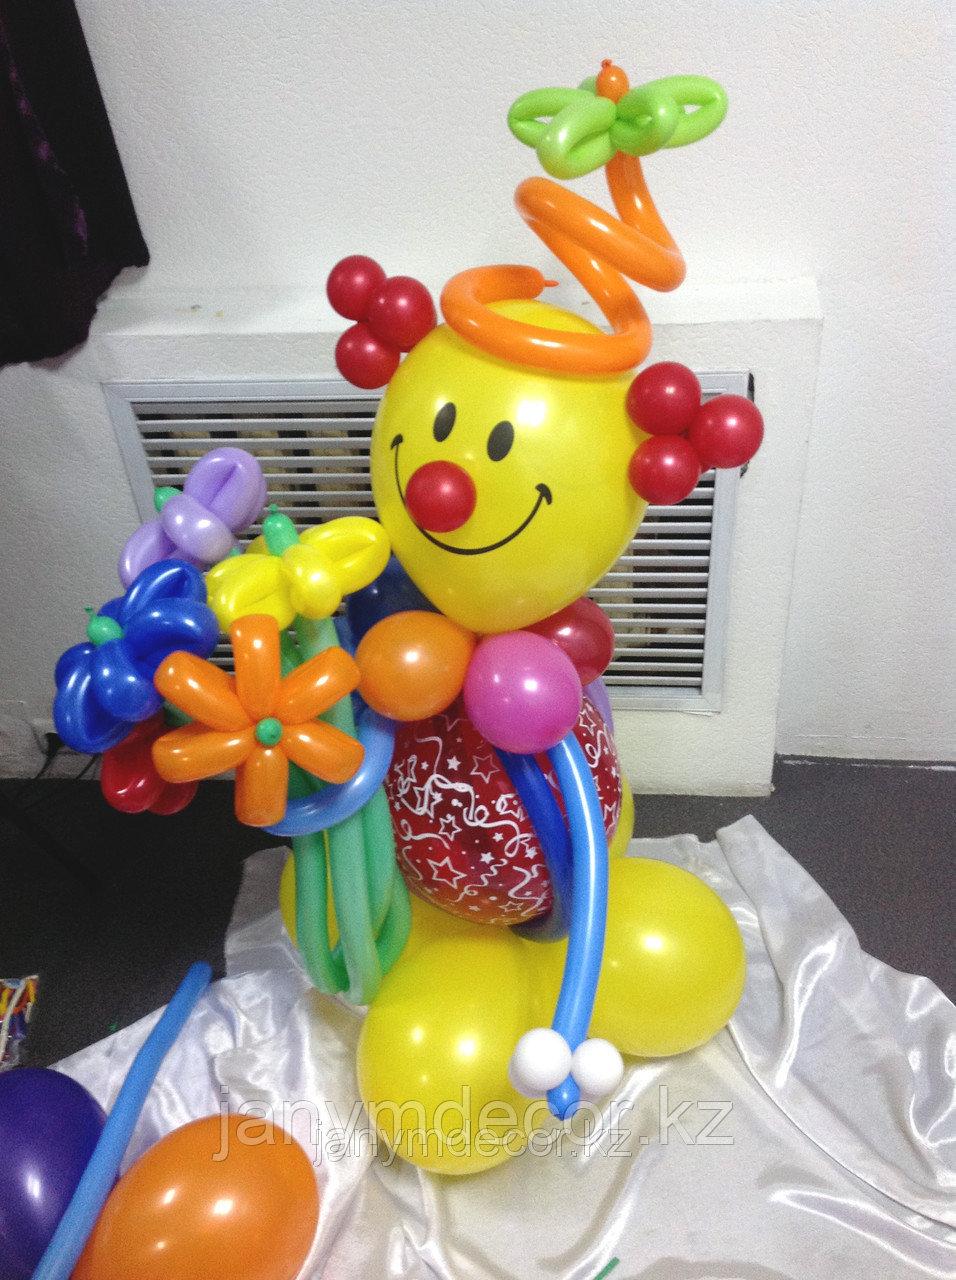 Клоун с букетом к 8 марта - фото 4